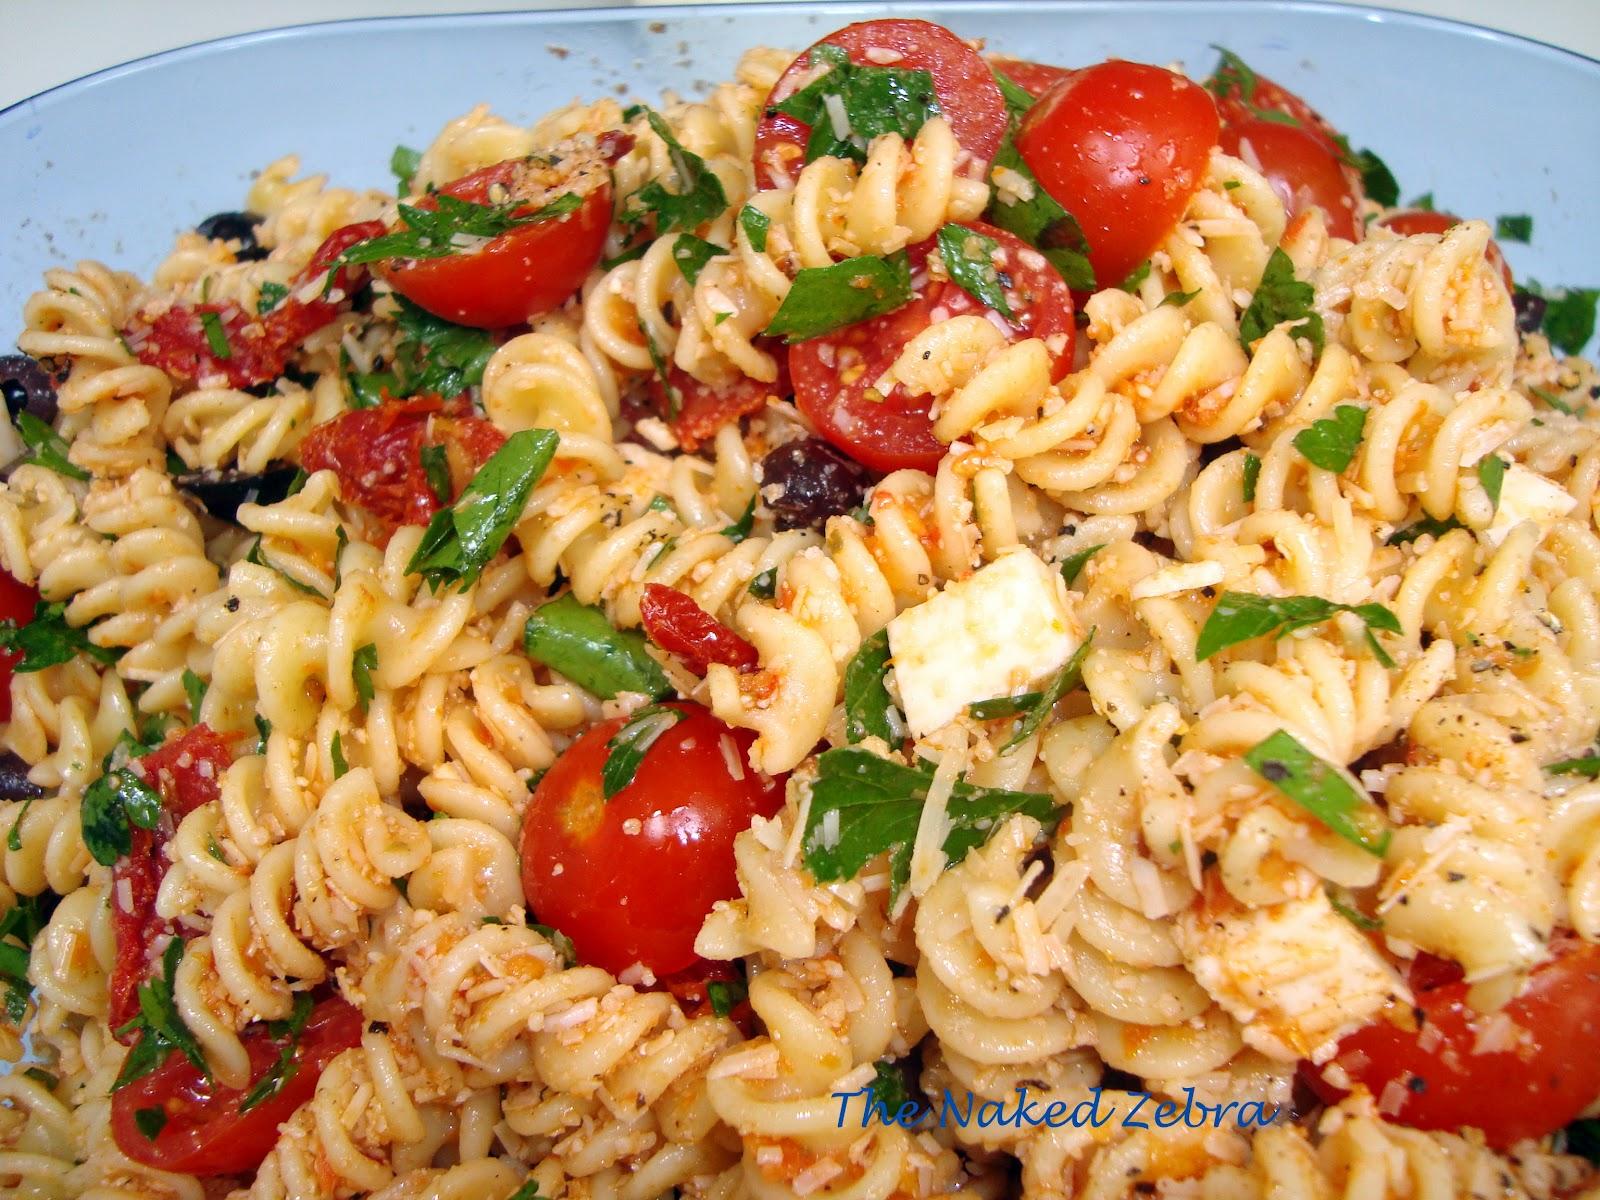 barefoot contessa ina garten recipes 10 barefoot contessa recipes